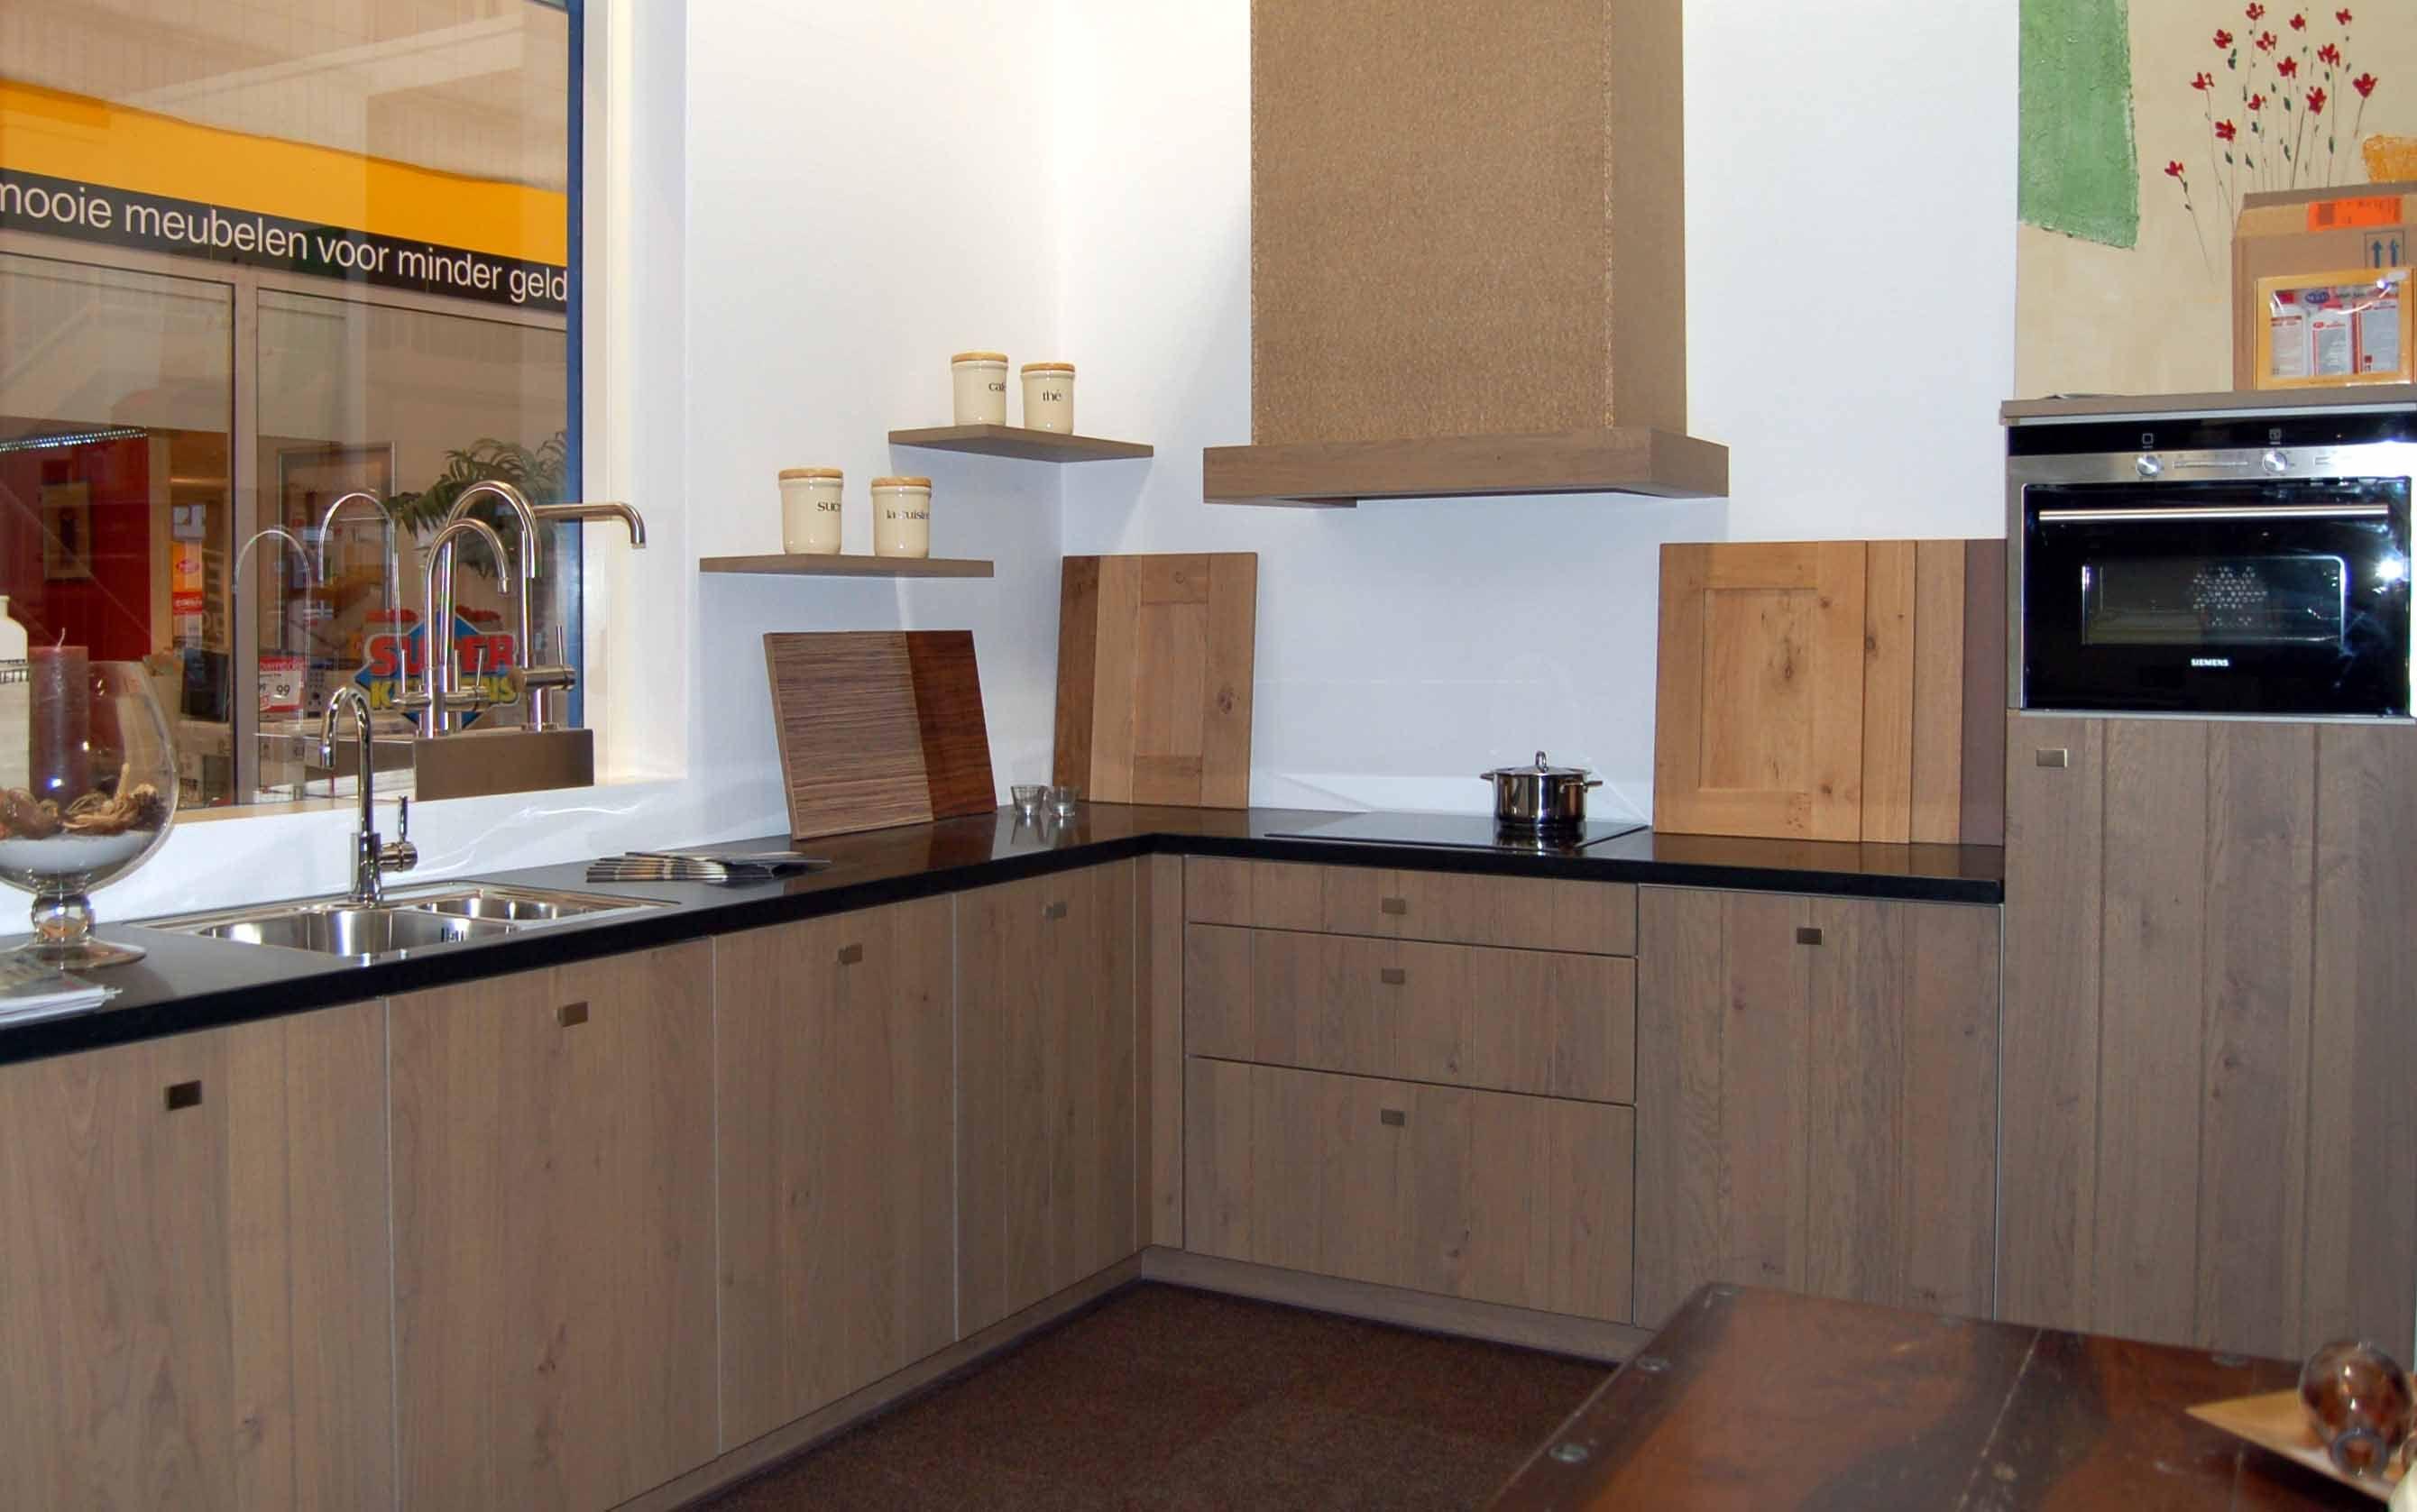 Allergrootste keukensite van nederland dordogne rustiek 32496 - Fotos van keukens ...